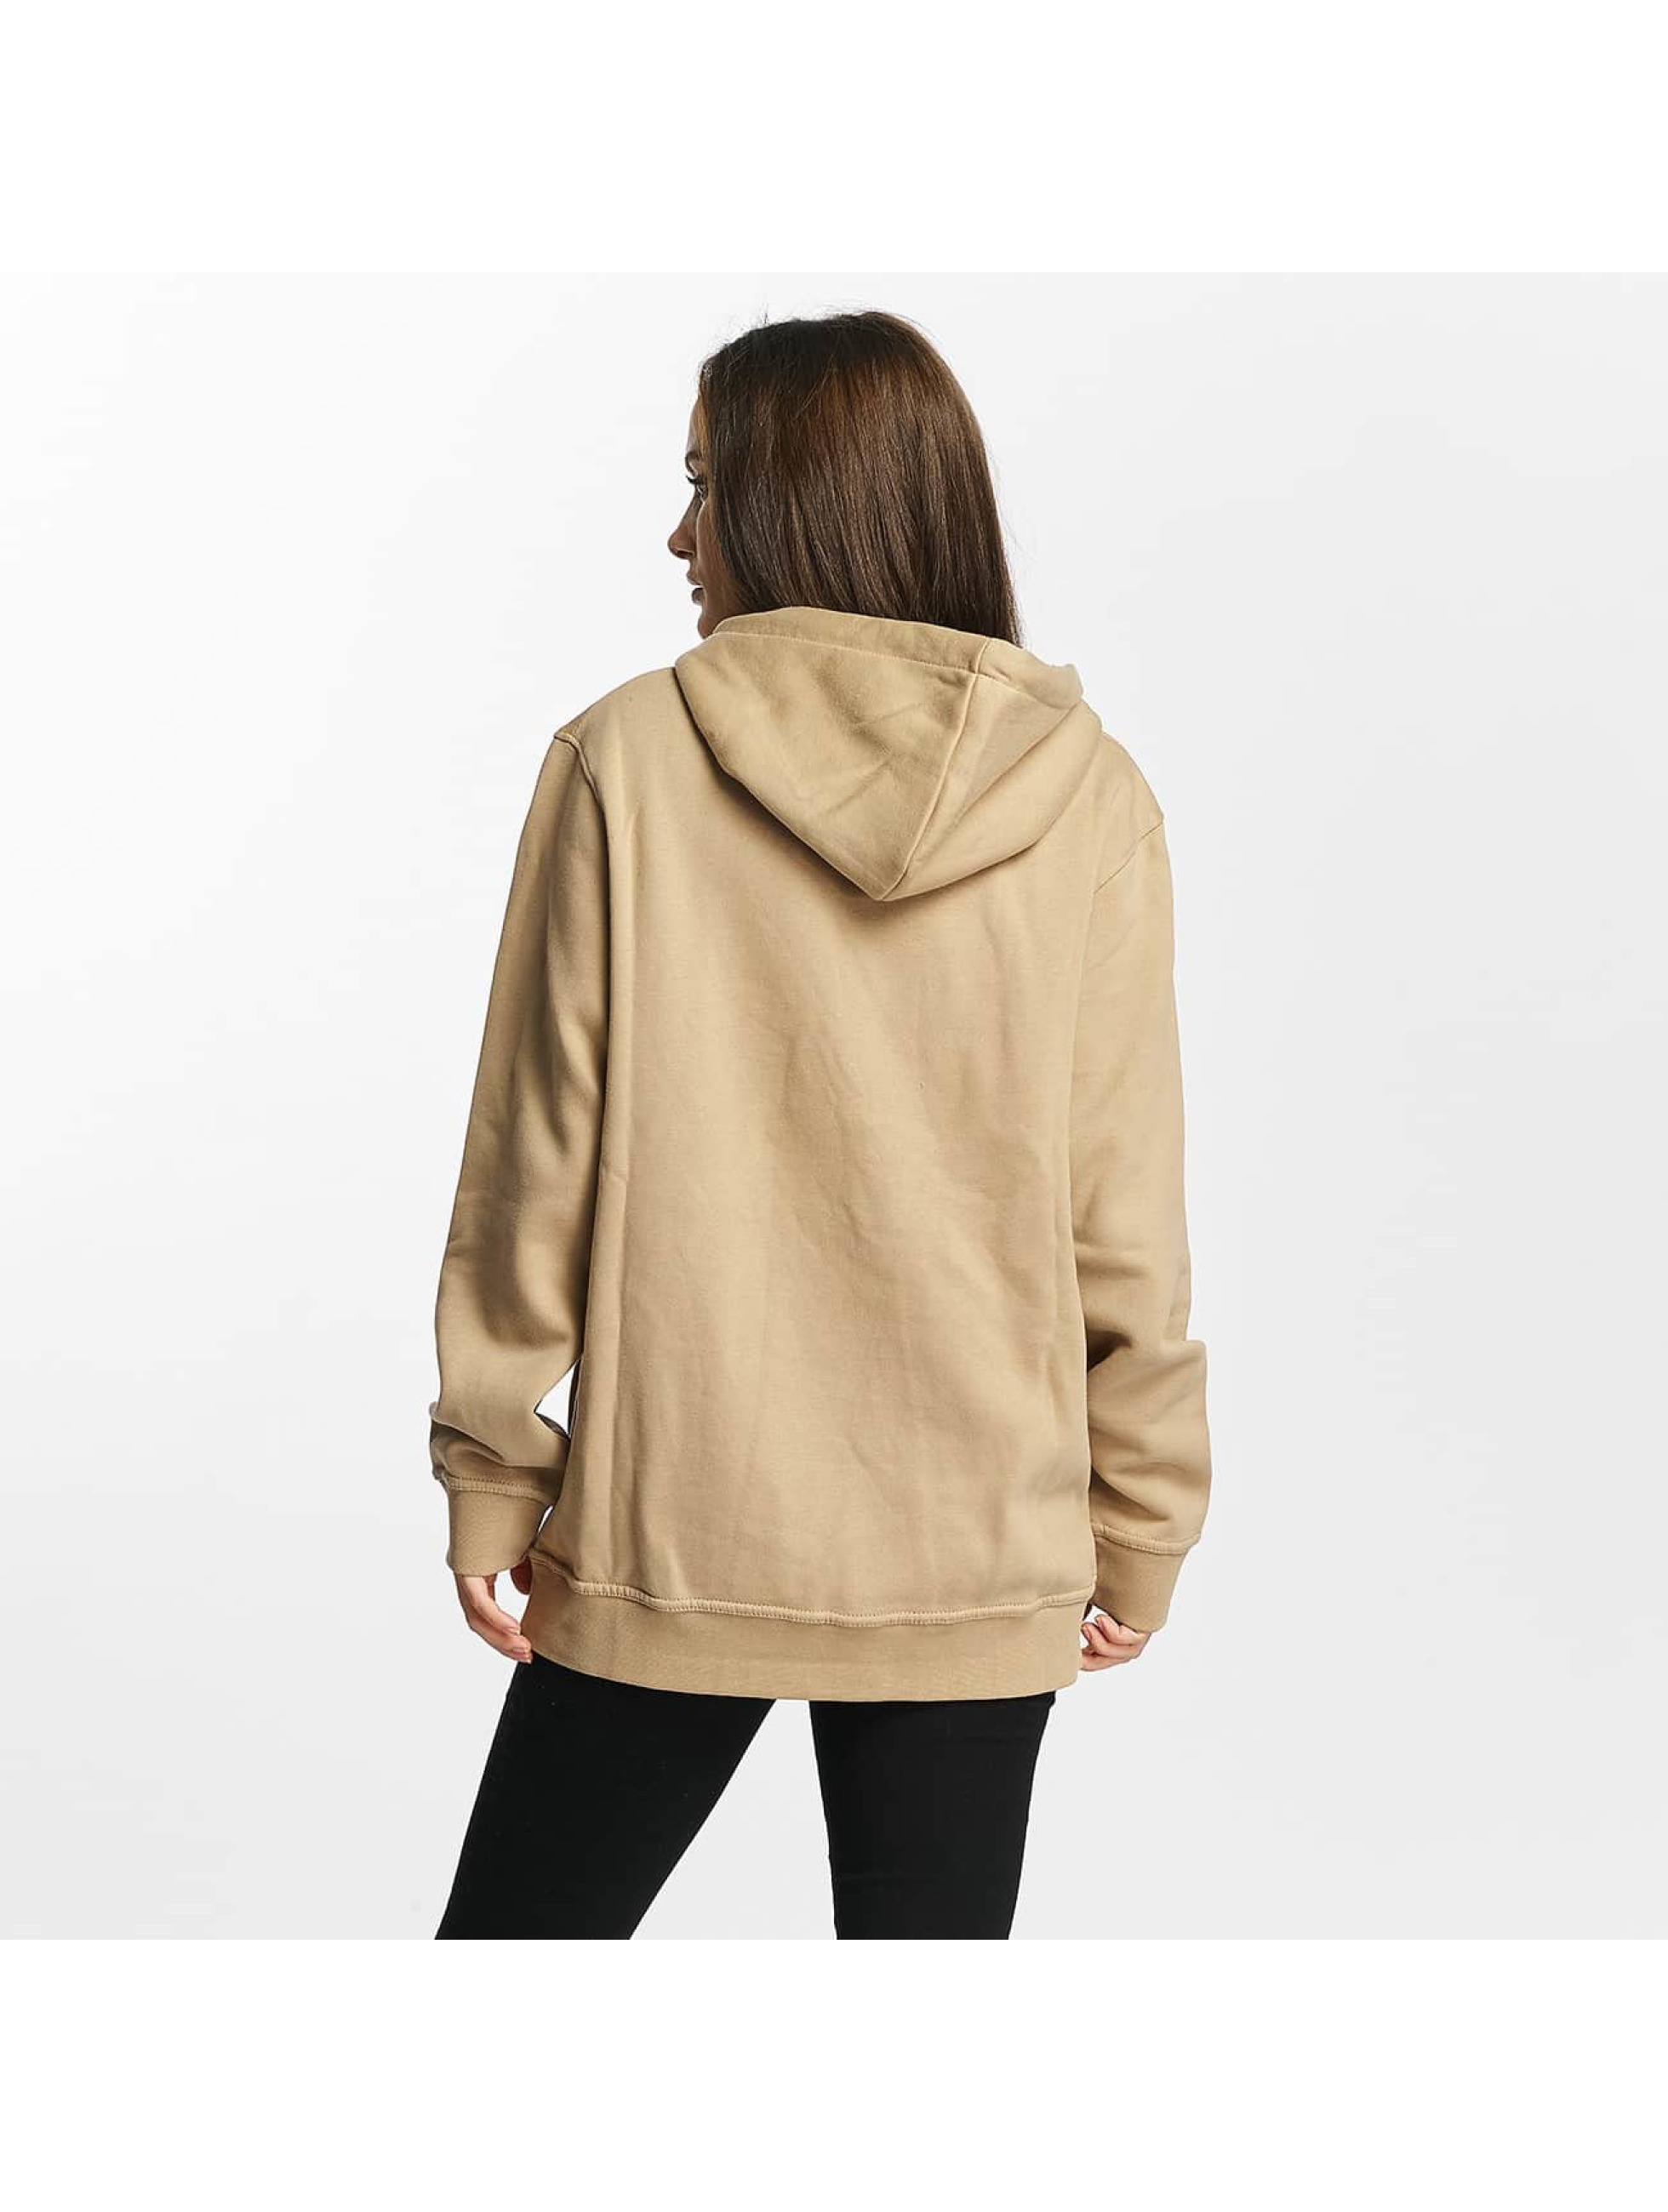 Cyprime Hoodies Aga Oversized beige